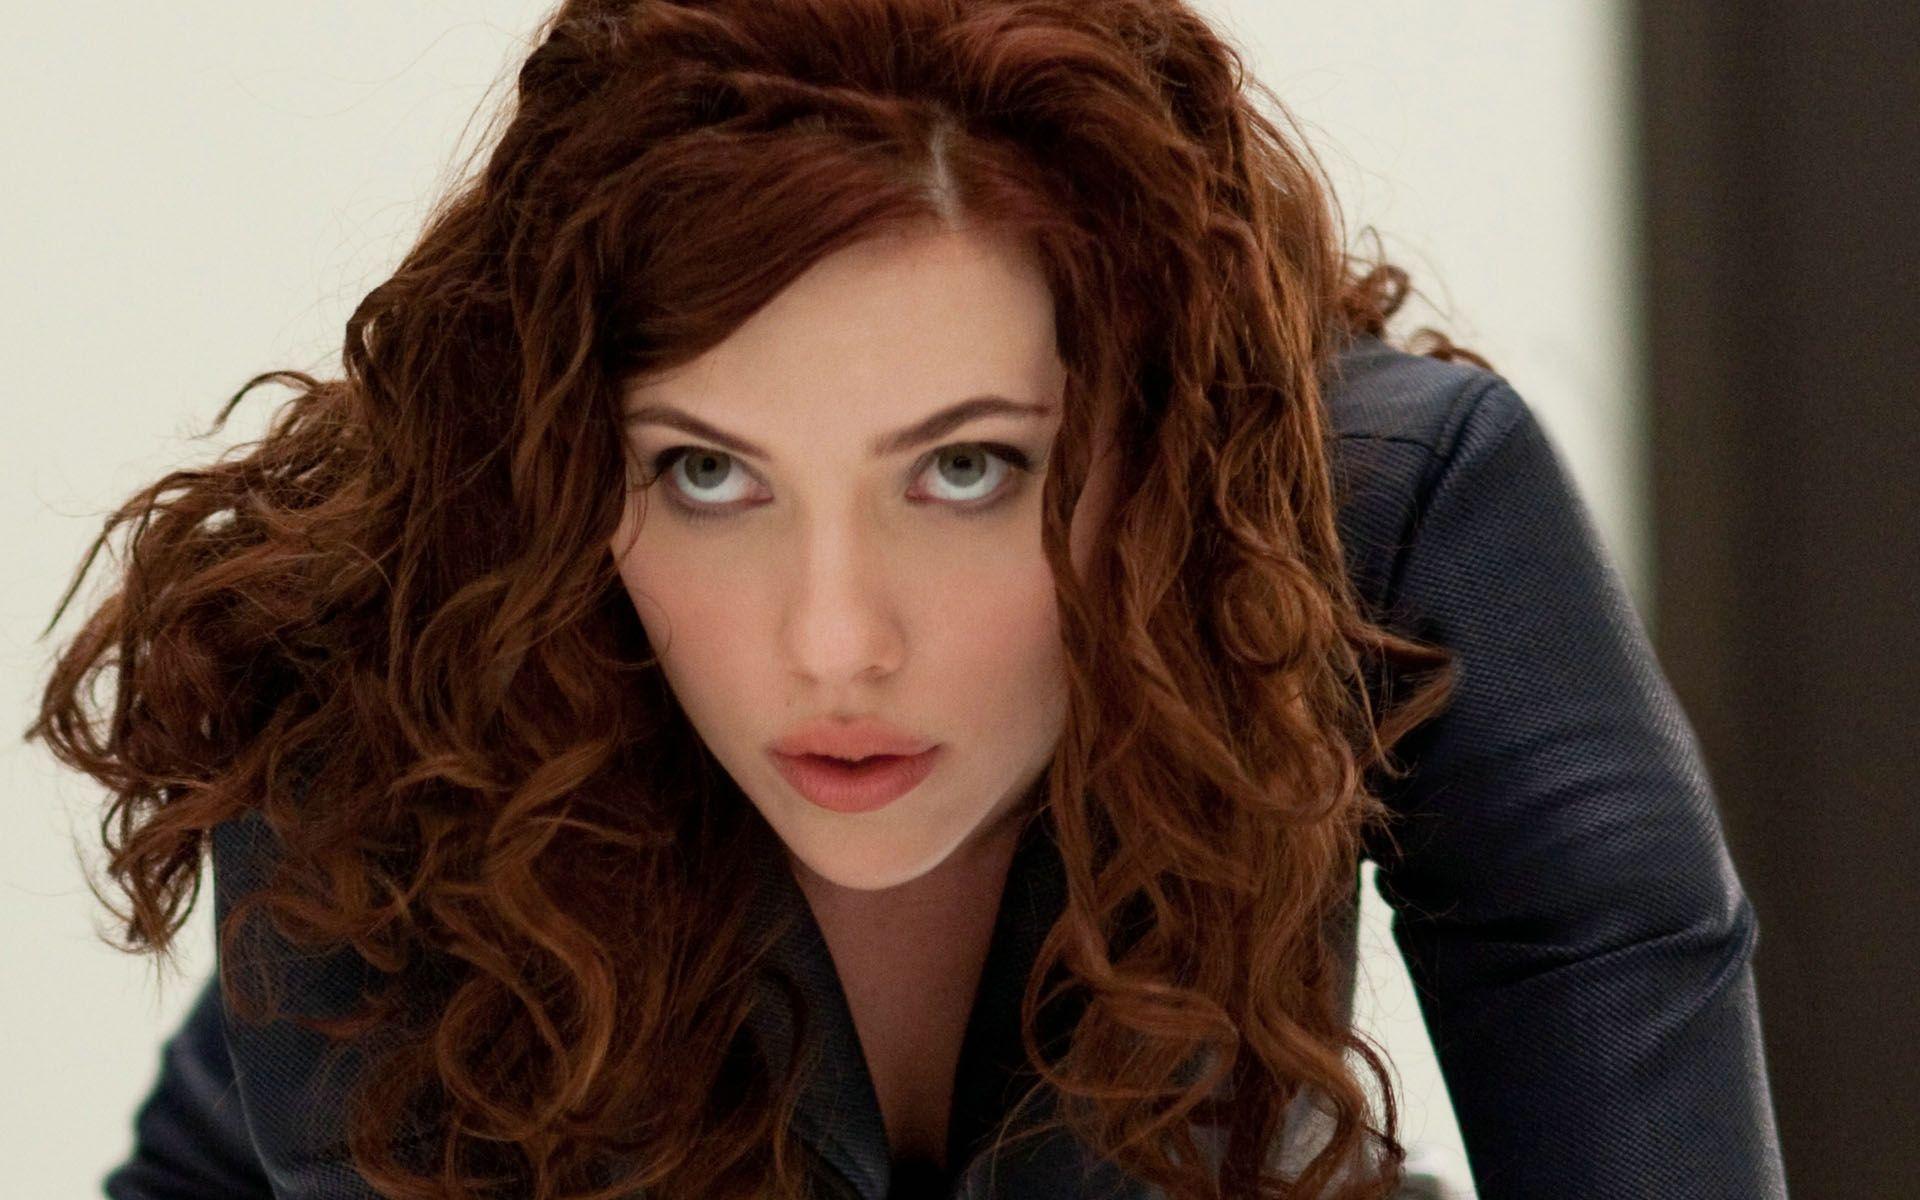 Cabelo De Fio A Fio Em Cada Olhar Eu Vejo Um Elogio Scarlett Johansson Red Hair Red Curly Hair Curly Hair Styles